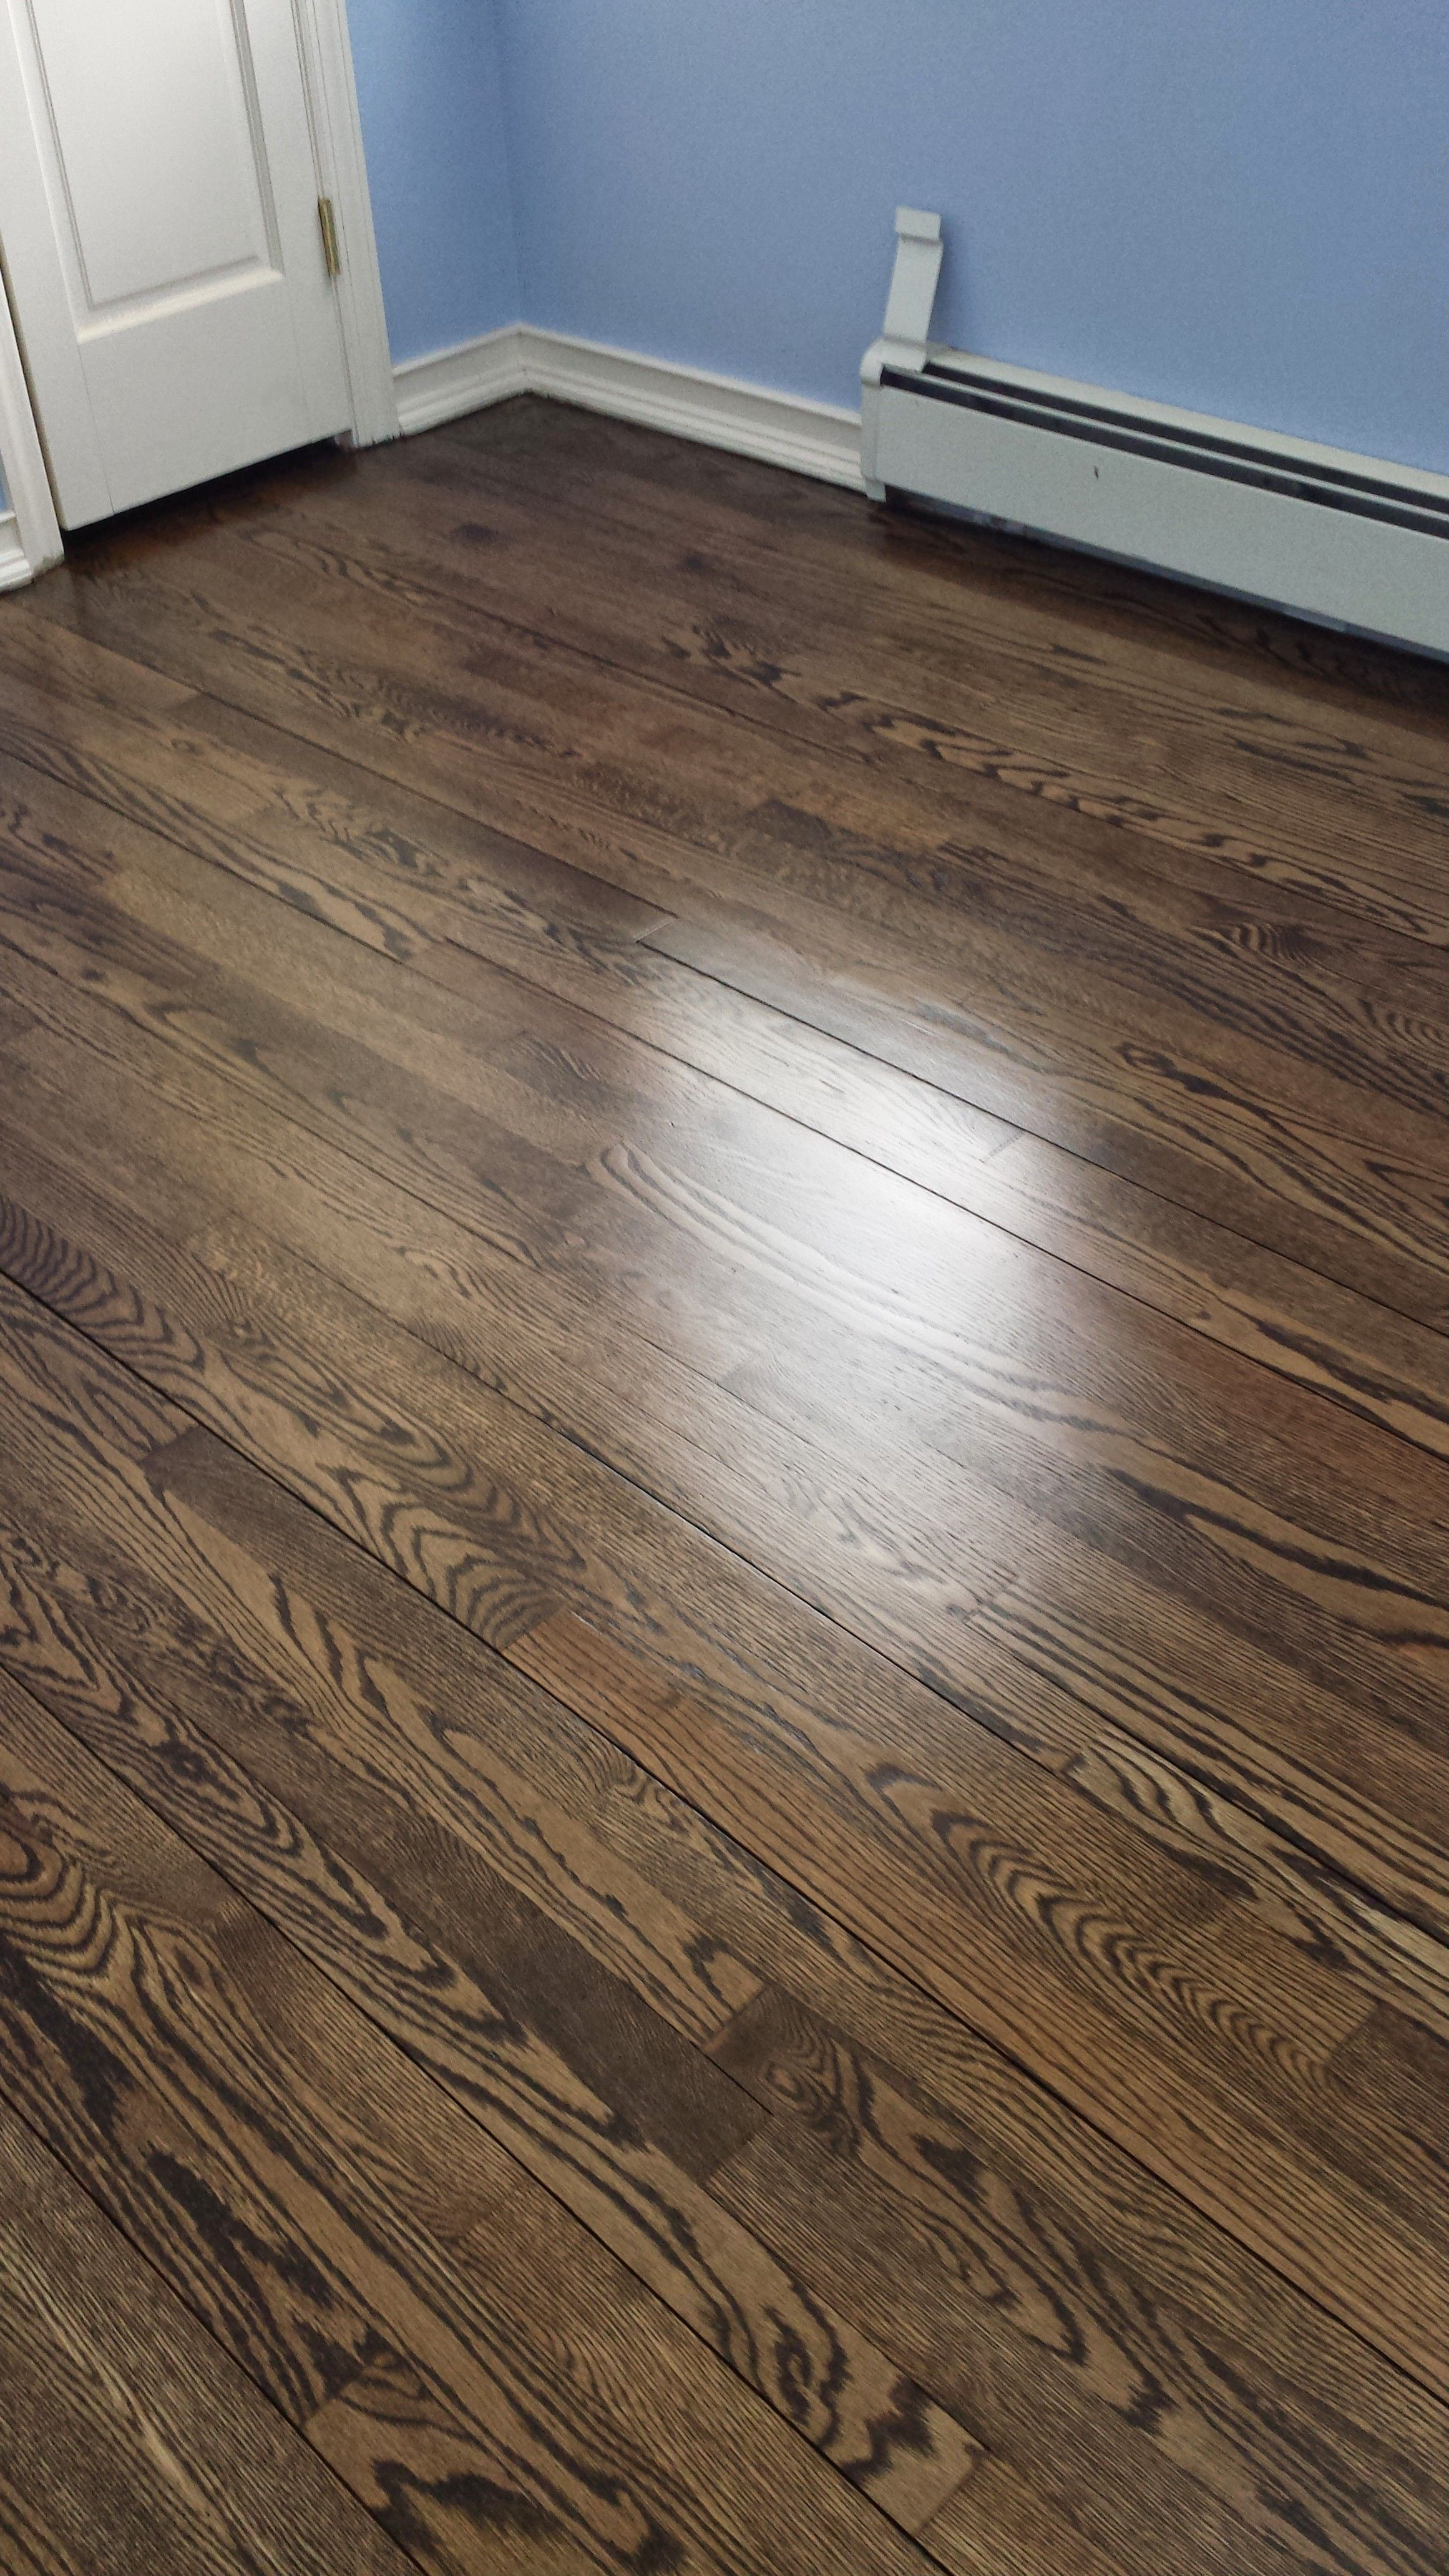 refinishing hardwood floors vs replacing cost of cost to refinish hardwood floors floor plan ideas intended for cost to refinish hardwood floors great methods to use for refinishing hardwood floors